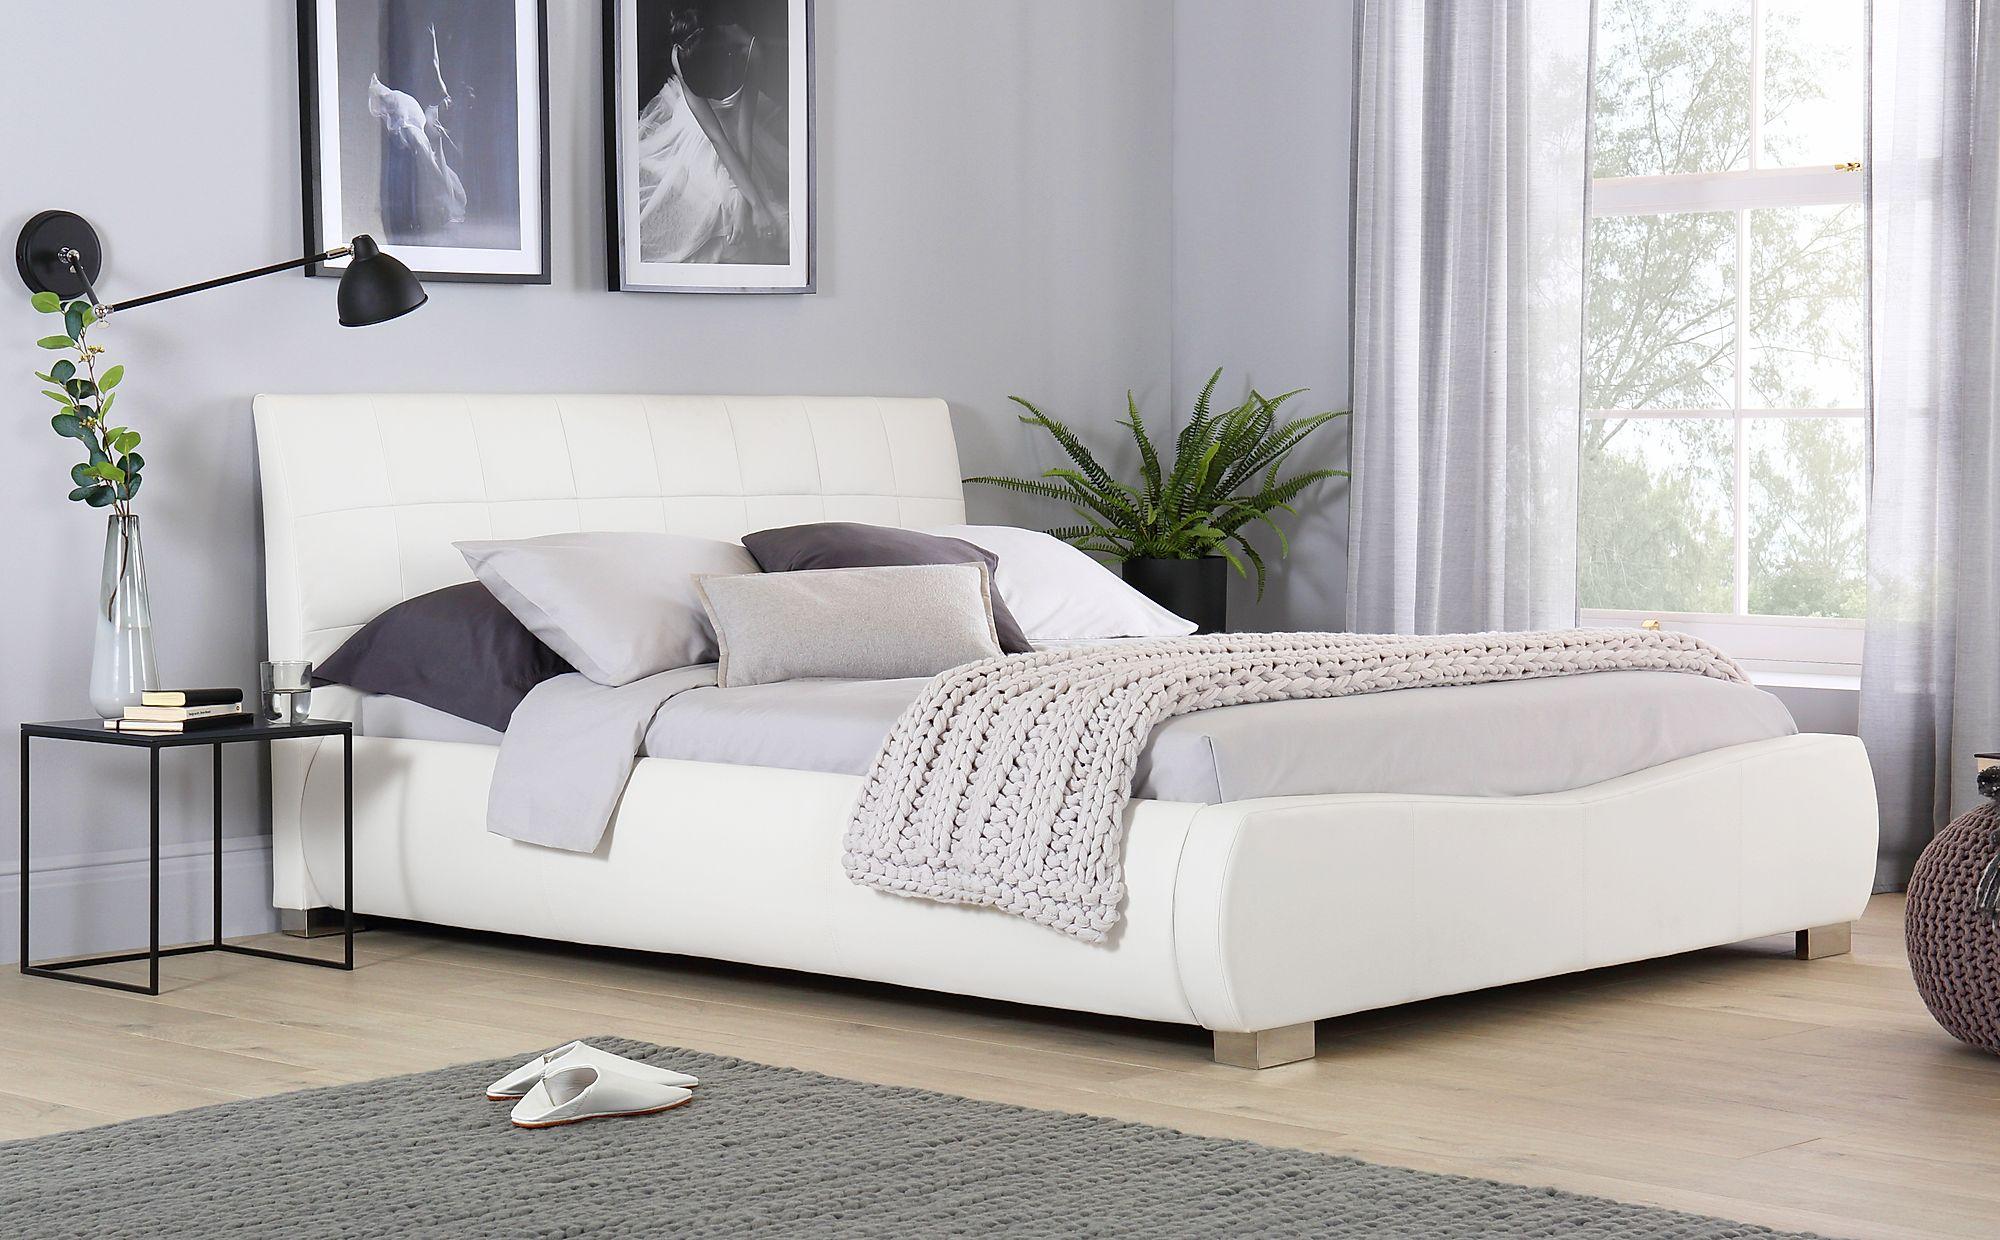 Dorado White Leather Super King Size Bed Furniture Choice